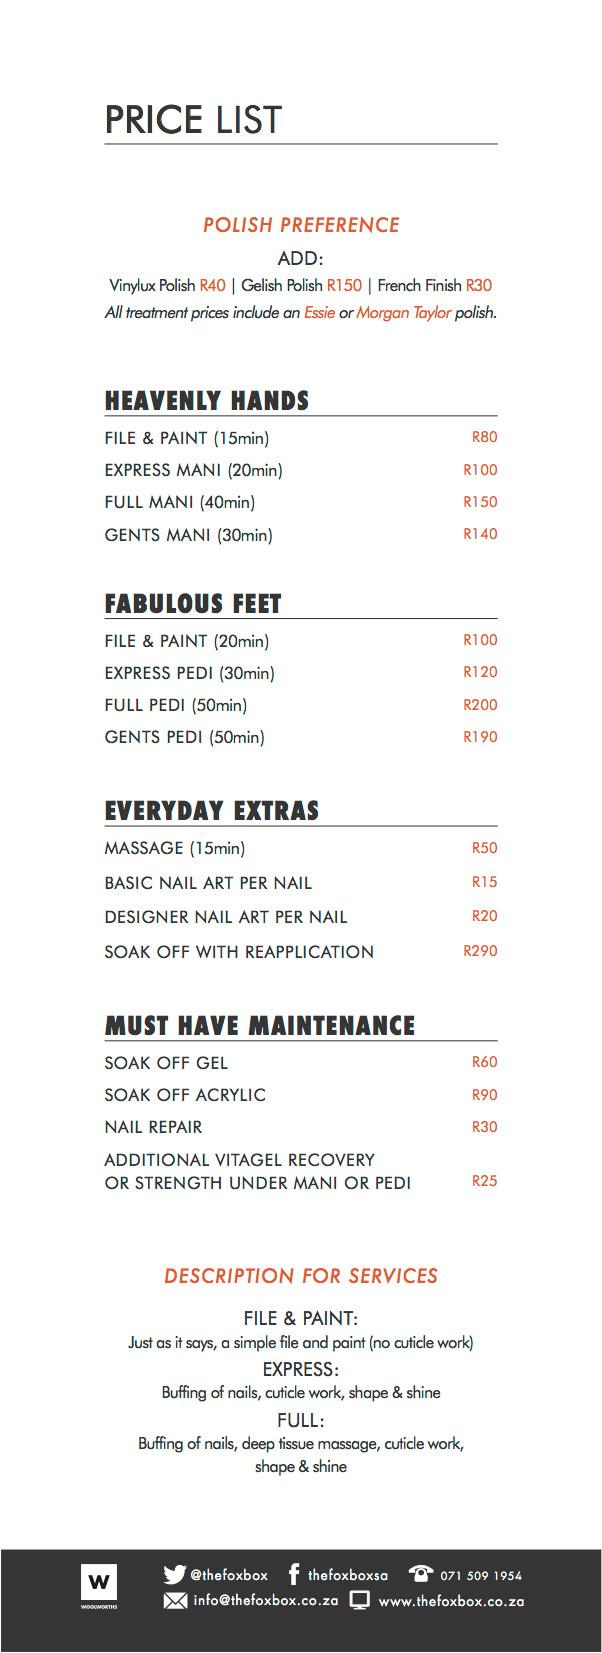 Woolworths Price List.jpg